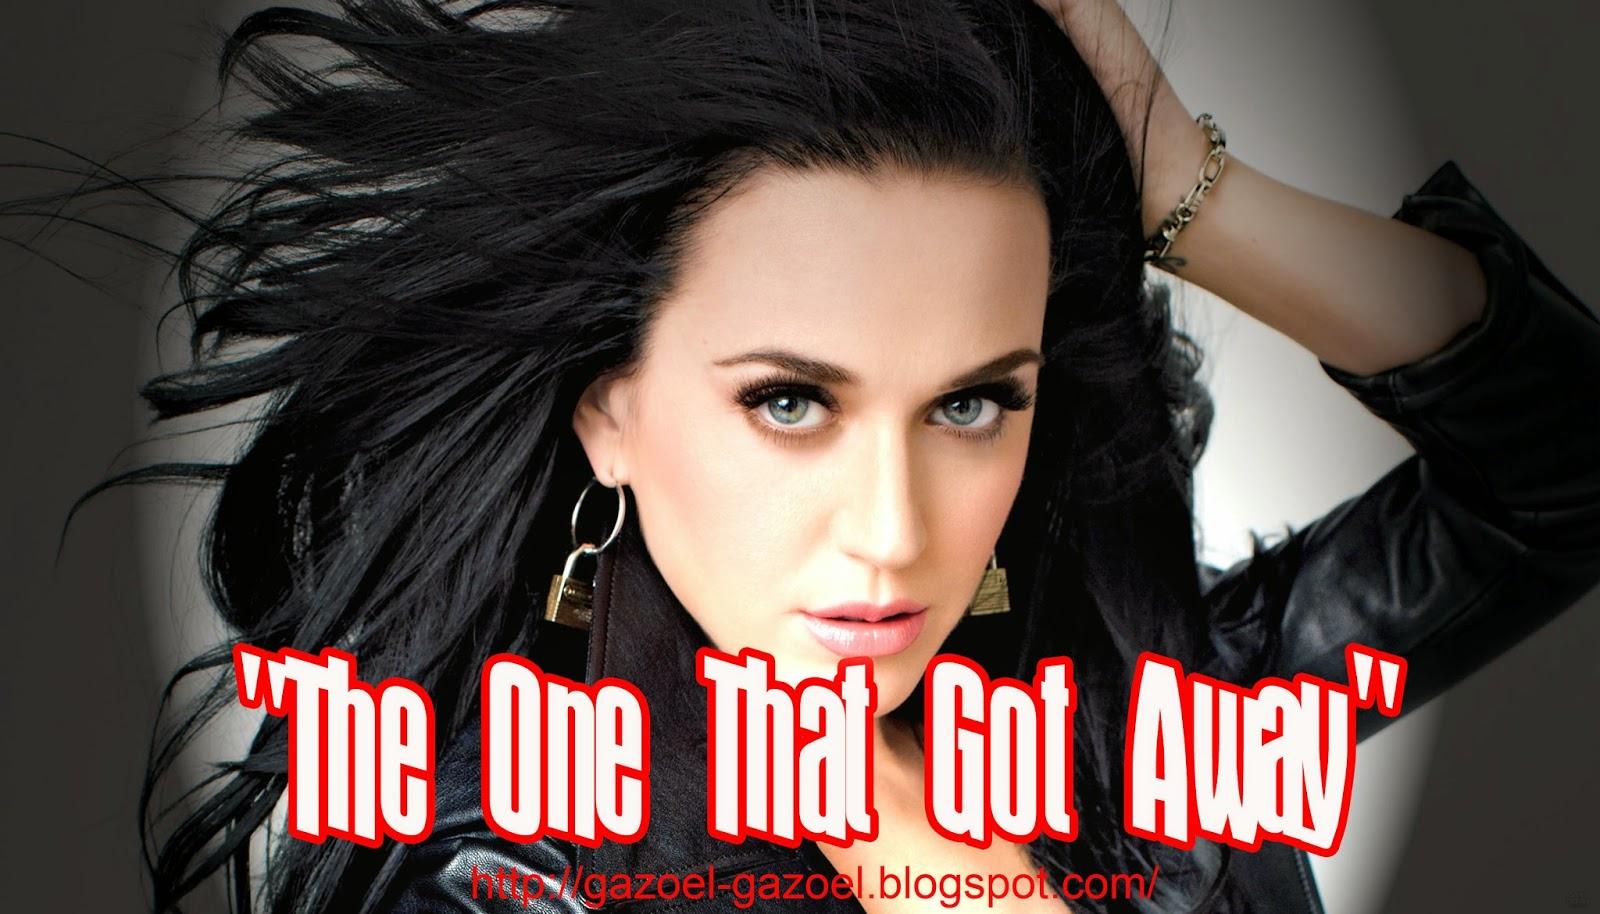 Lirik Lagu Katy Perry The One That Got Away Saling Berbagi